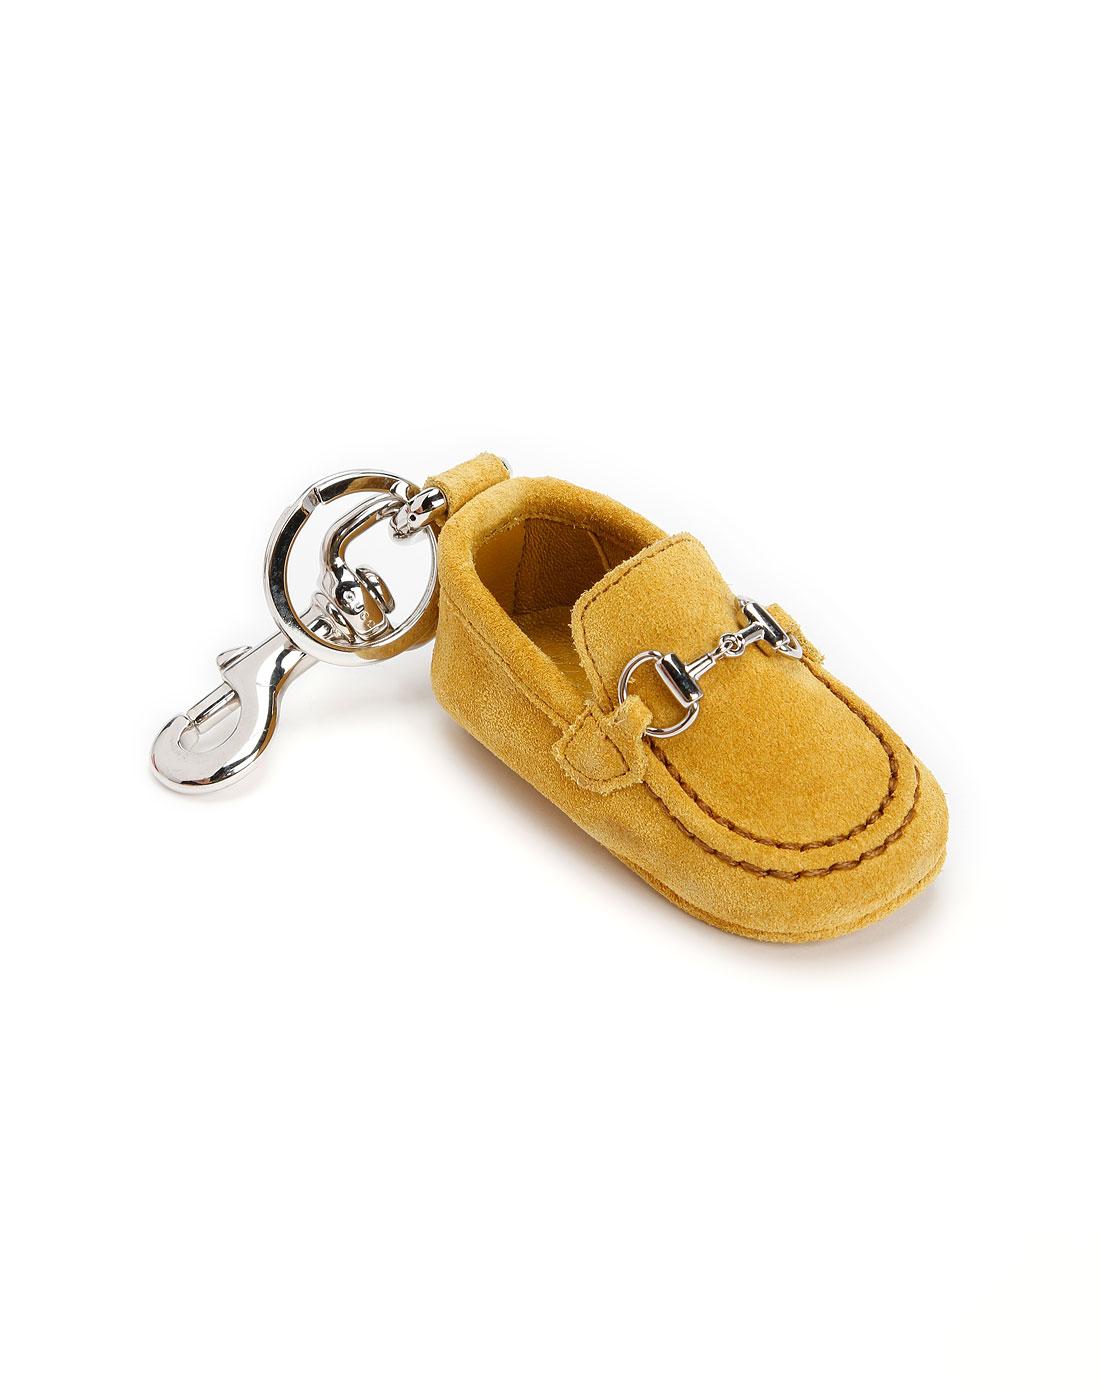 gucci黄色鞋子钥匙扣